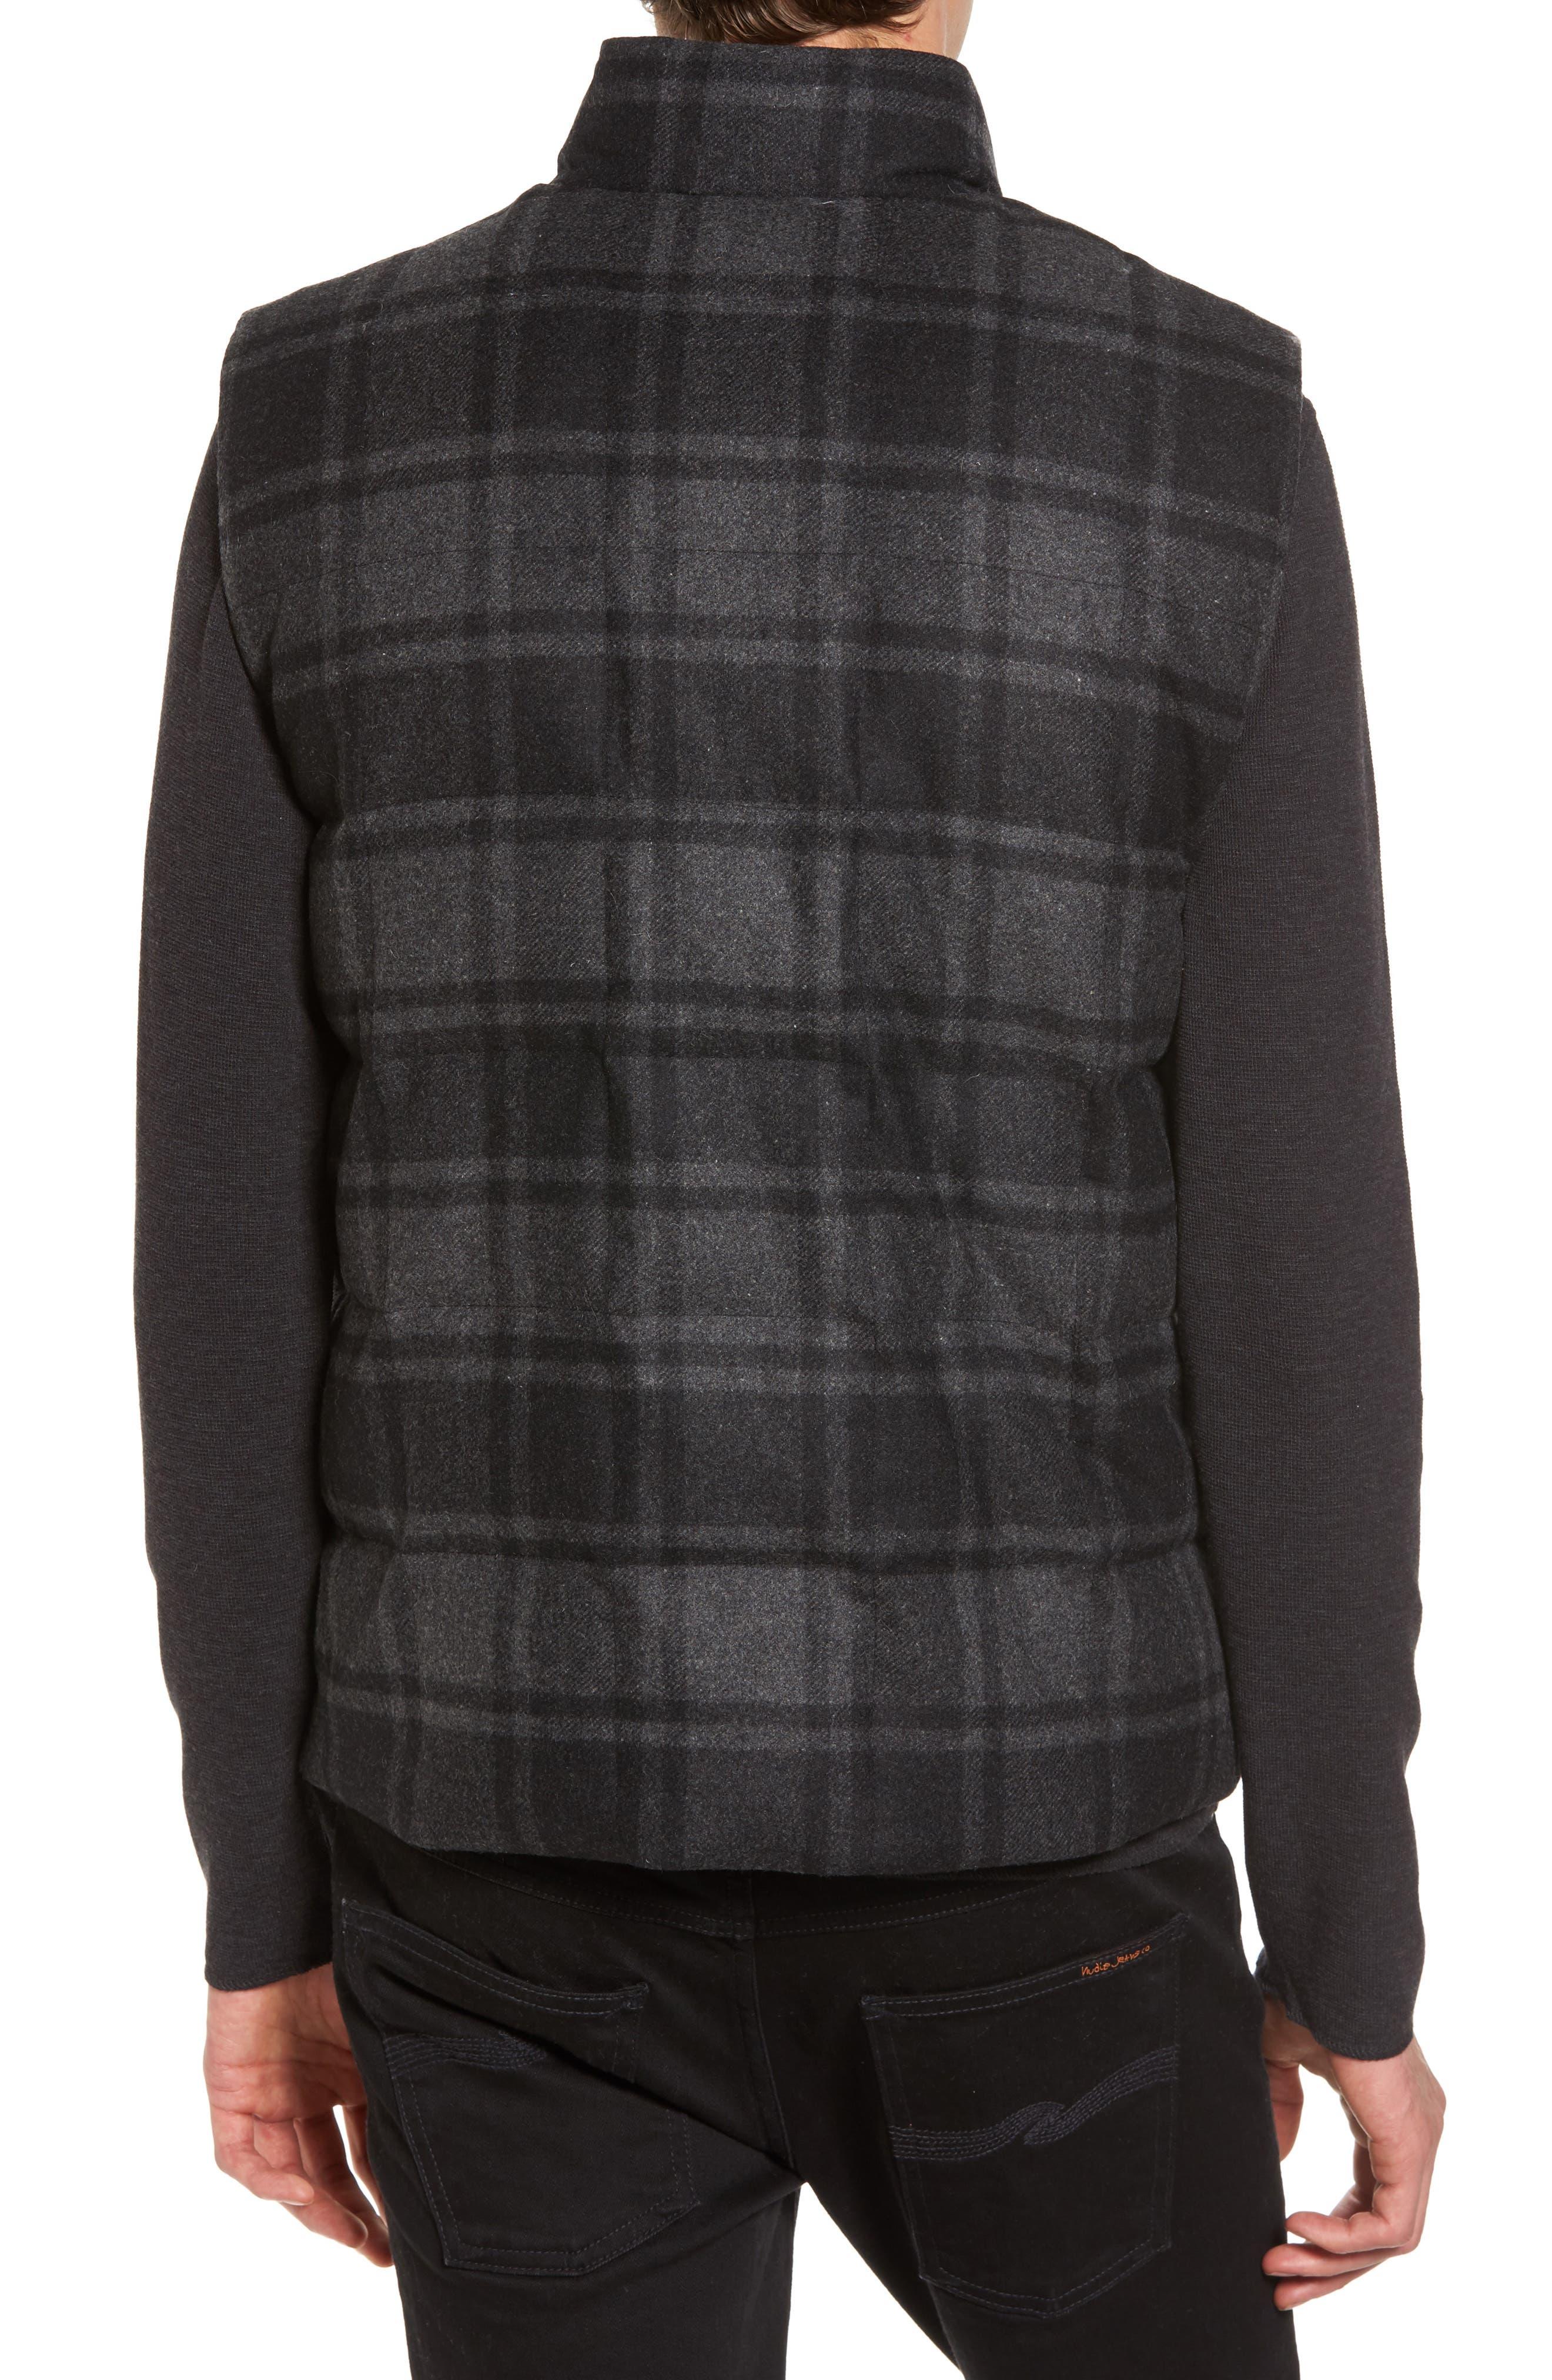 Yosemite Jacket,                             Alternate thumbnail 2, color,                             Black/ Charcoal Plaid